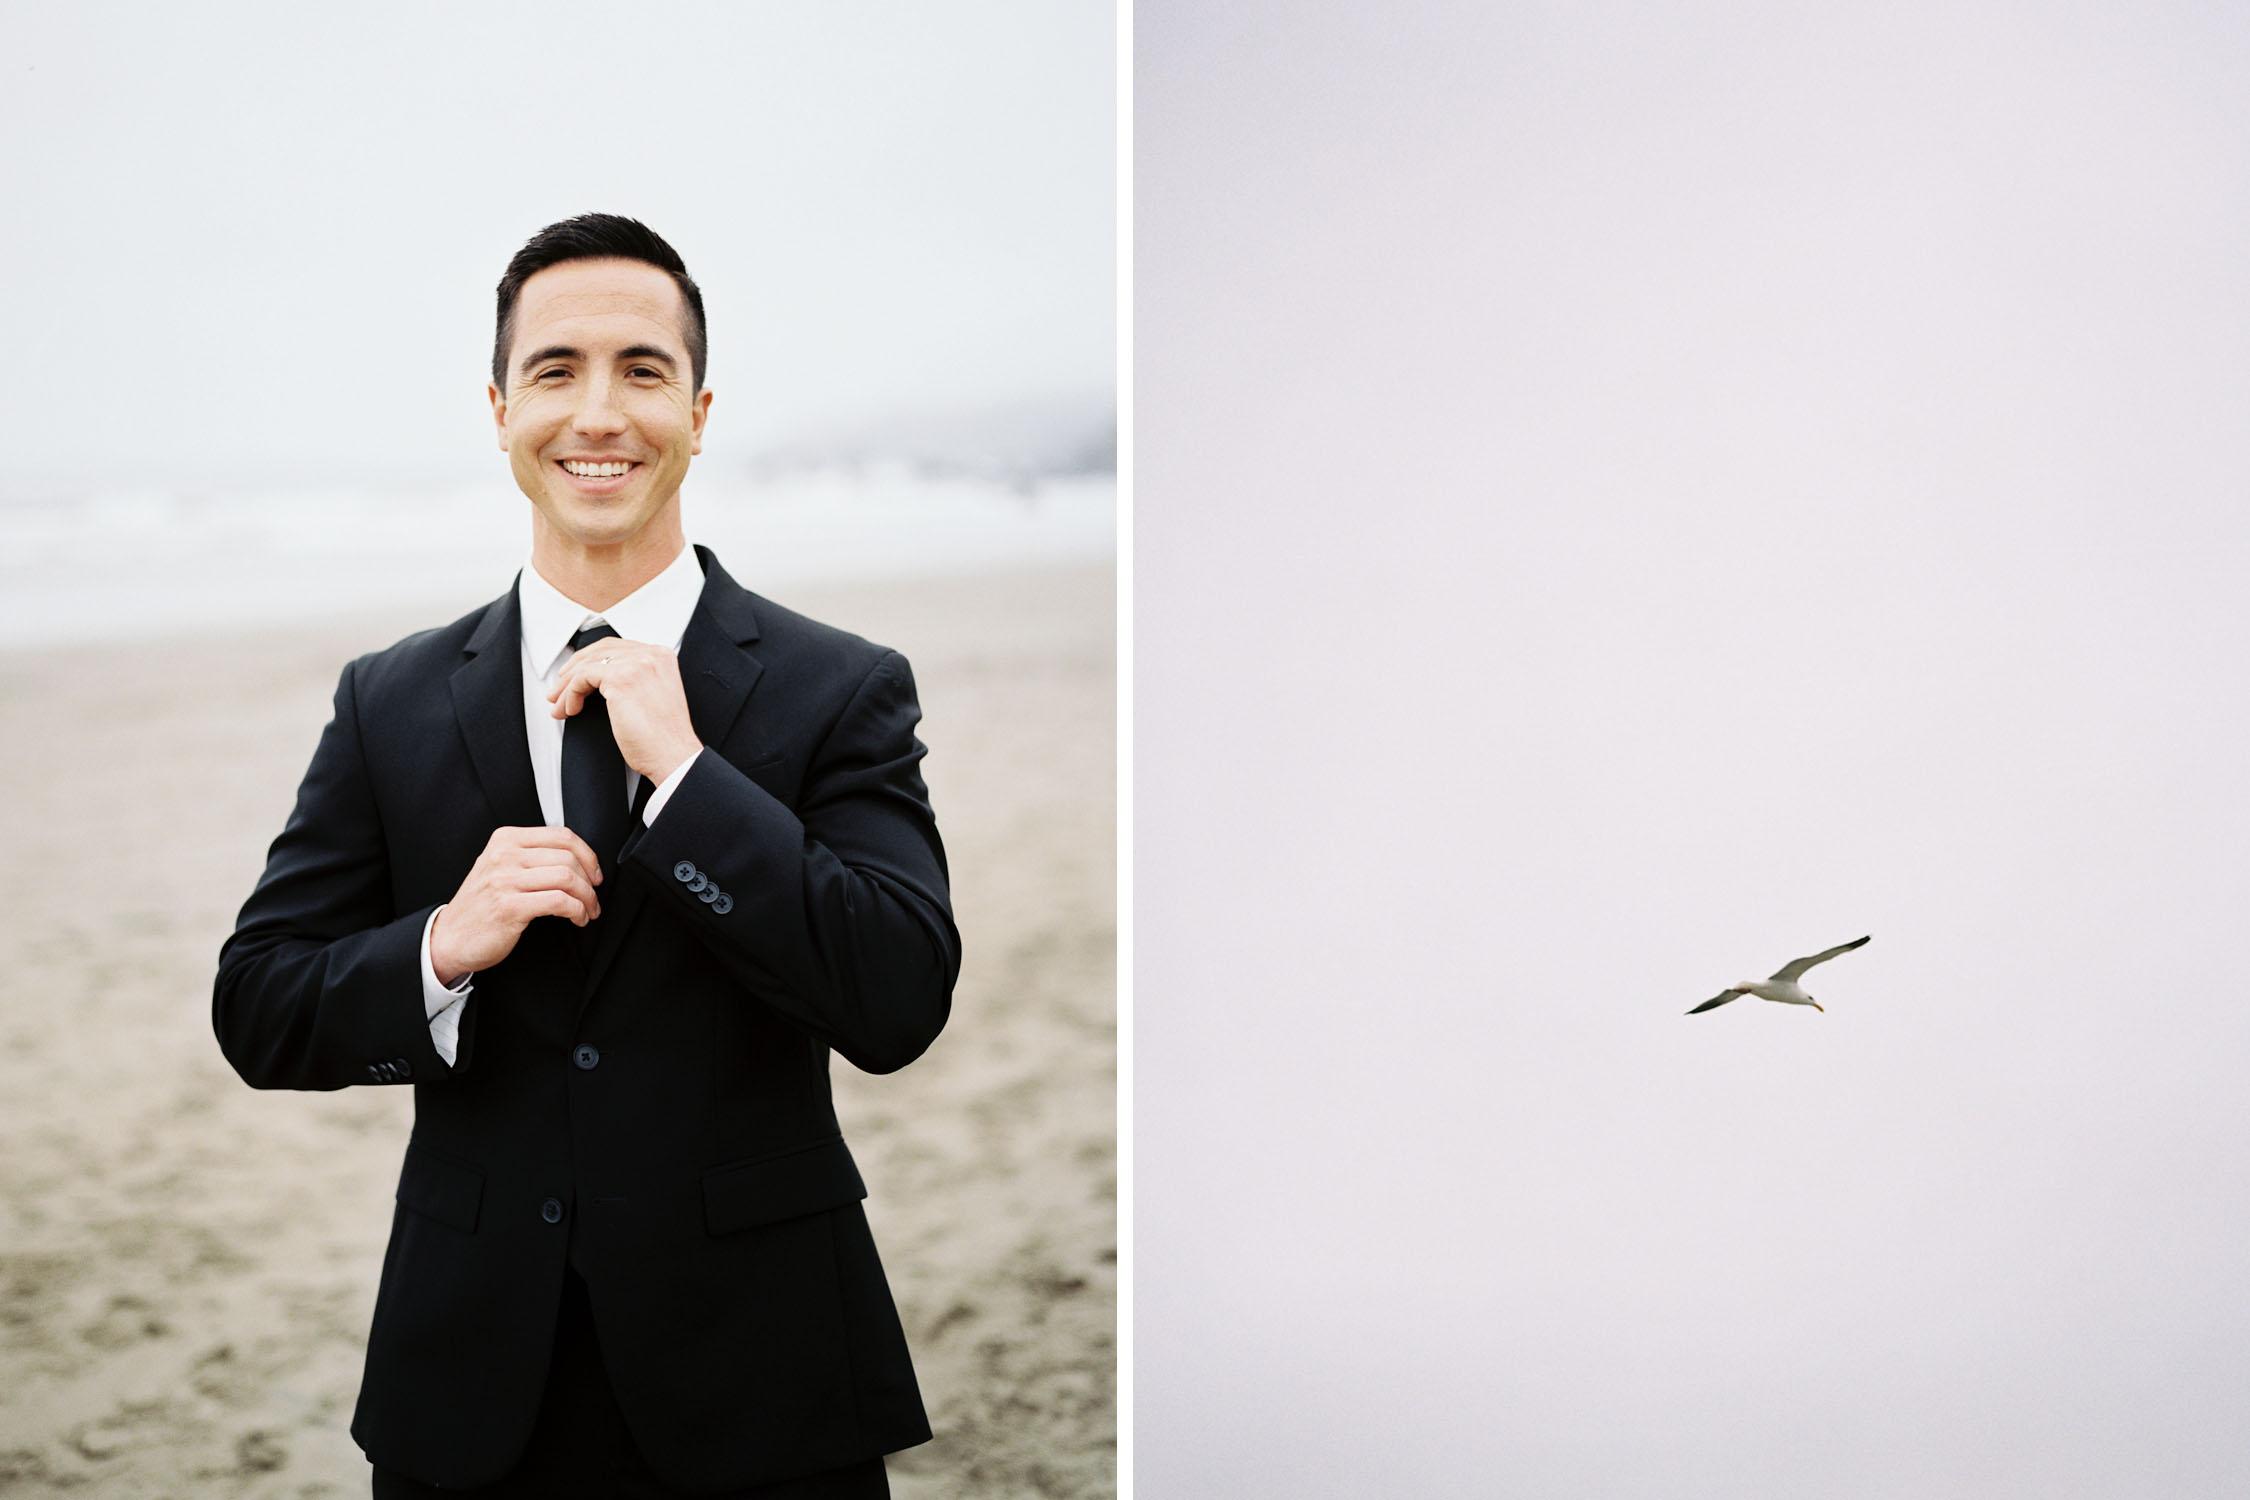 Bozeman-Montana-San Francisco-Bay Area-Wedding-Photographer-3.jpg